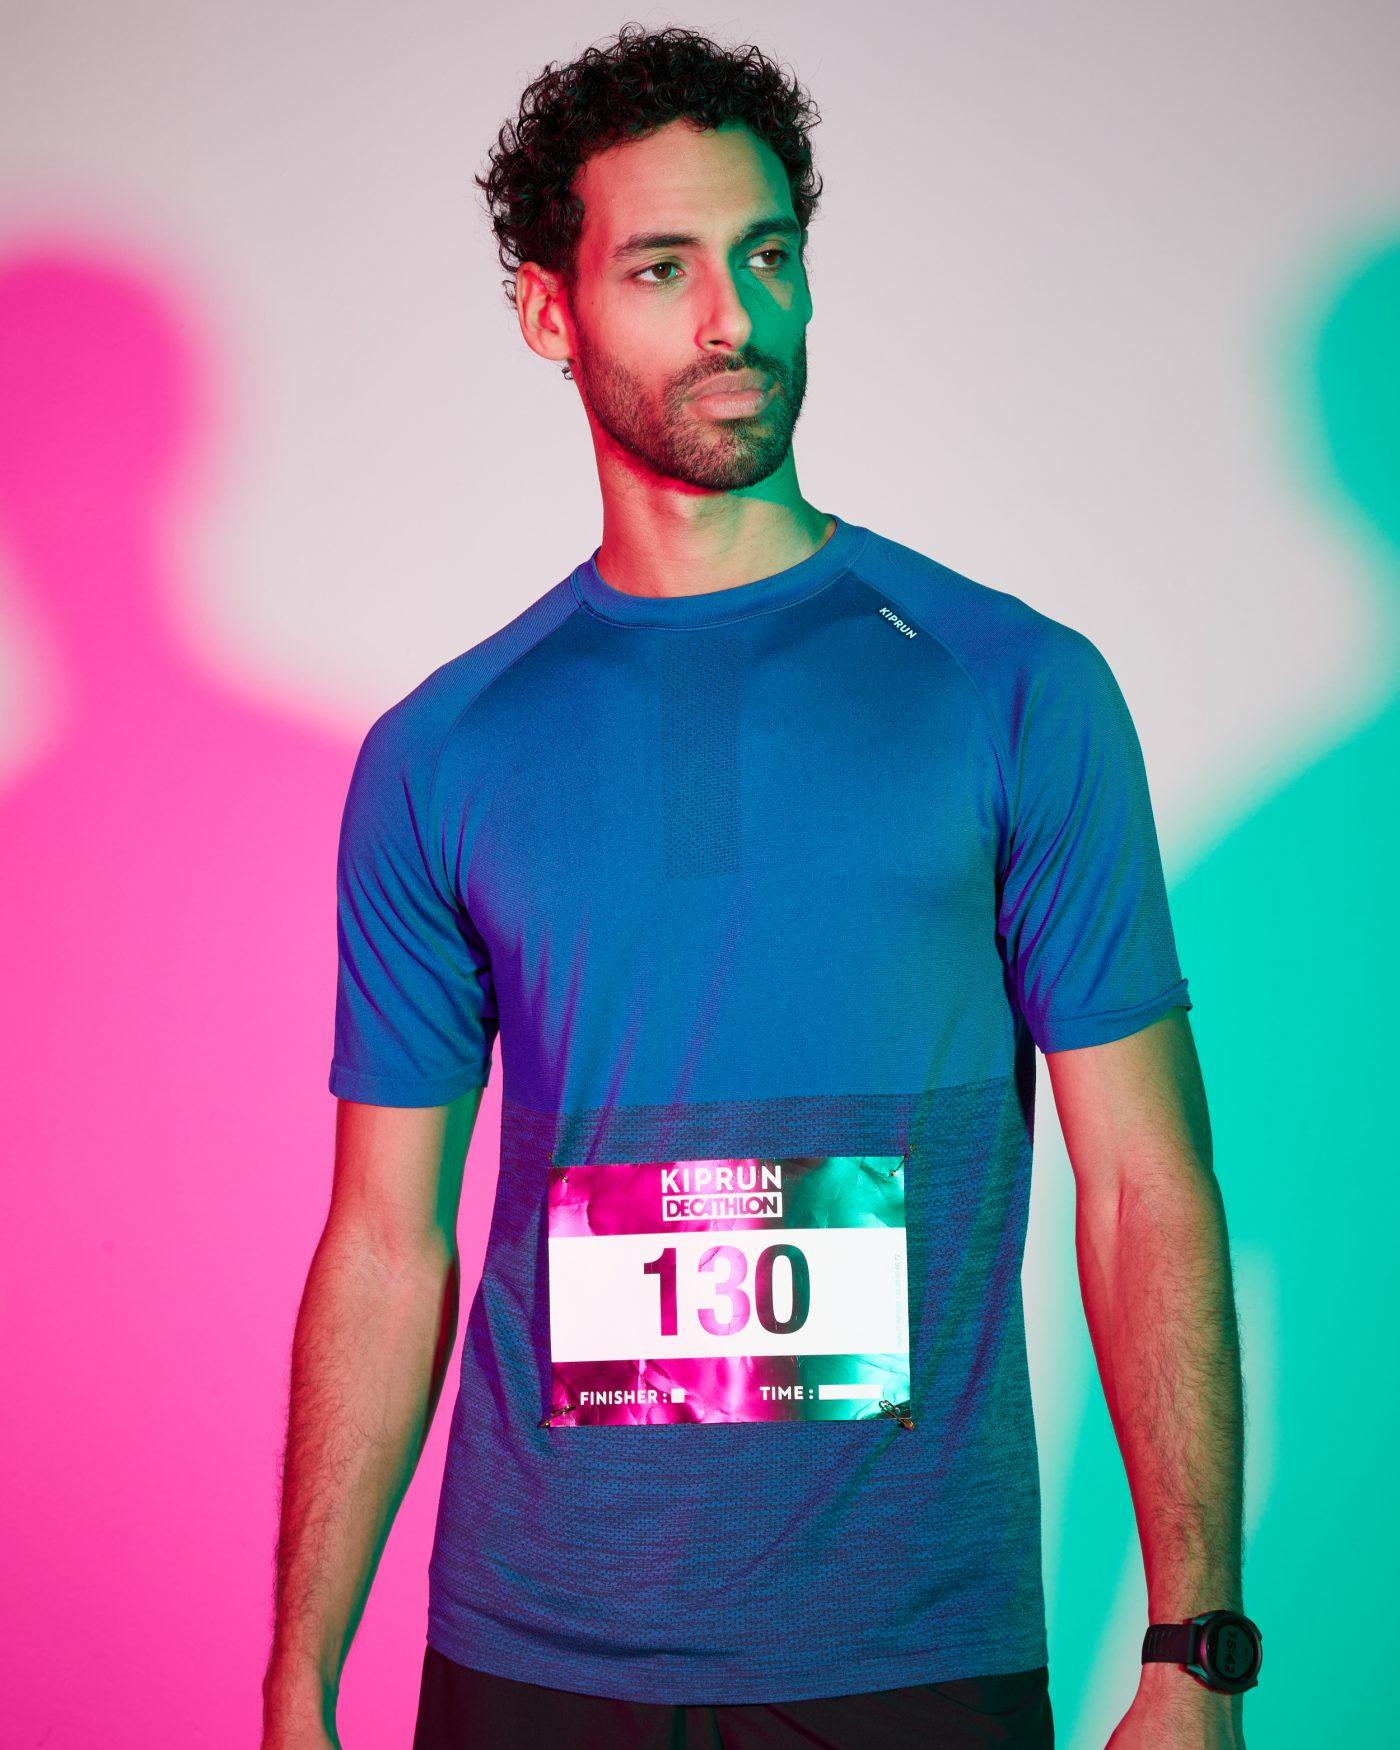 decathlon-kiprun-care-hommes-running-runpack-10